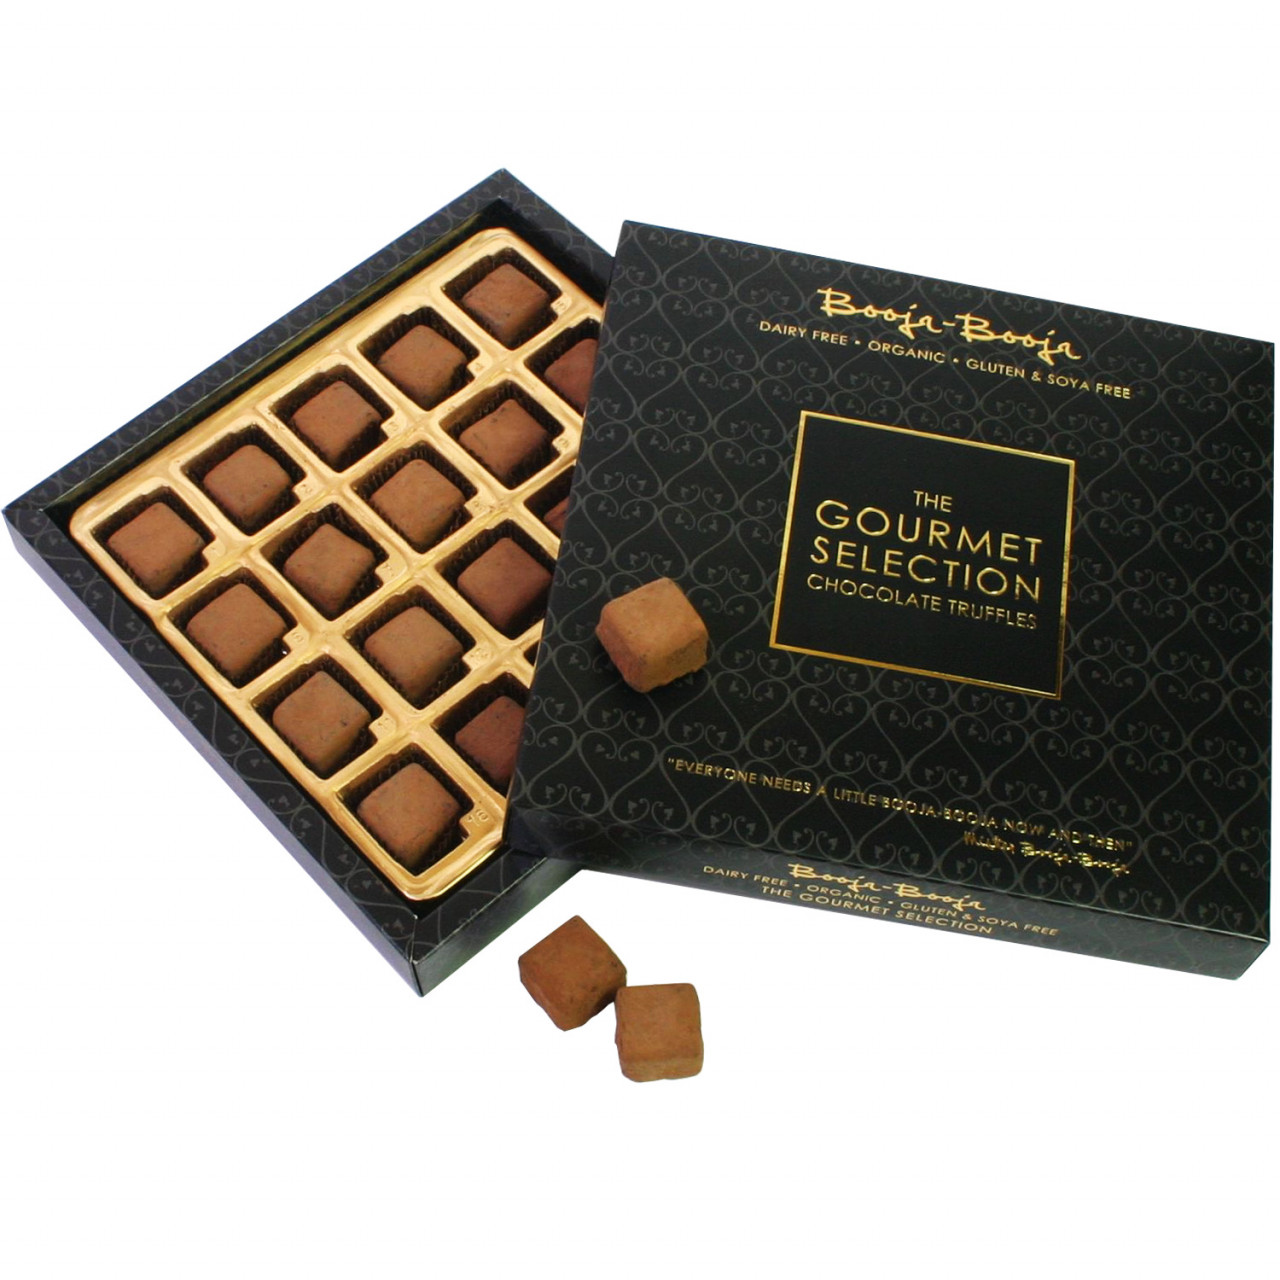 dunkle Schokolade, truffes, truffles, Pralinen, Haselnuss, Ingwer, Espresso, Bananen Toffee, Champagner Trüffel